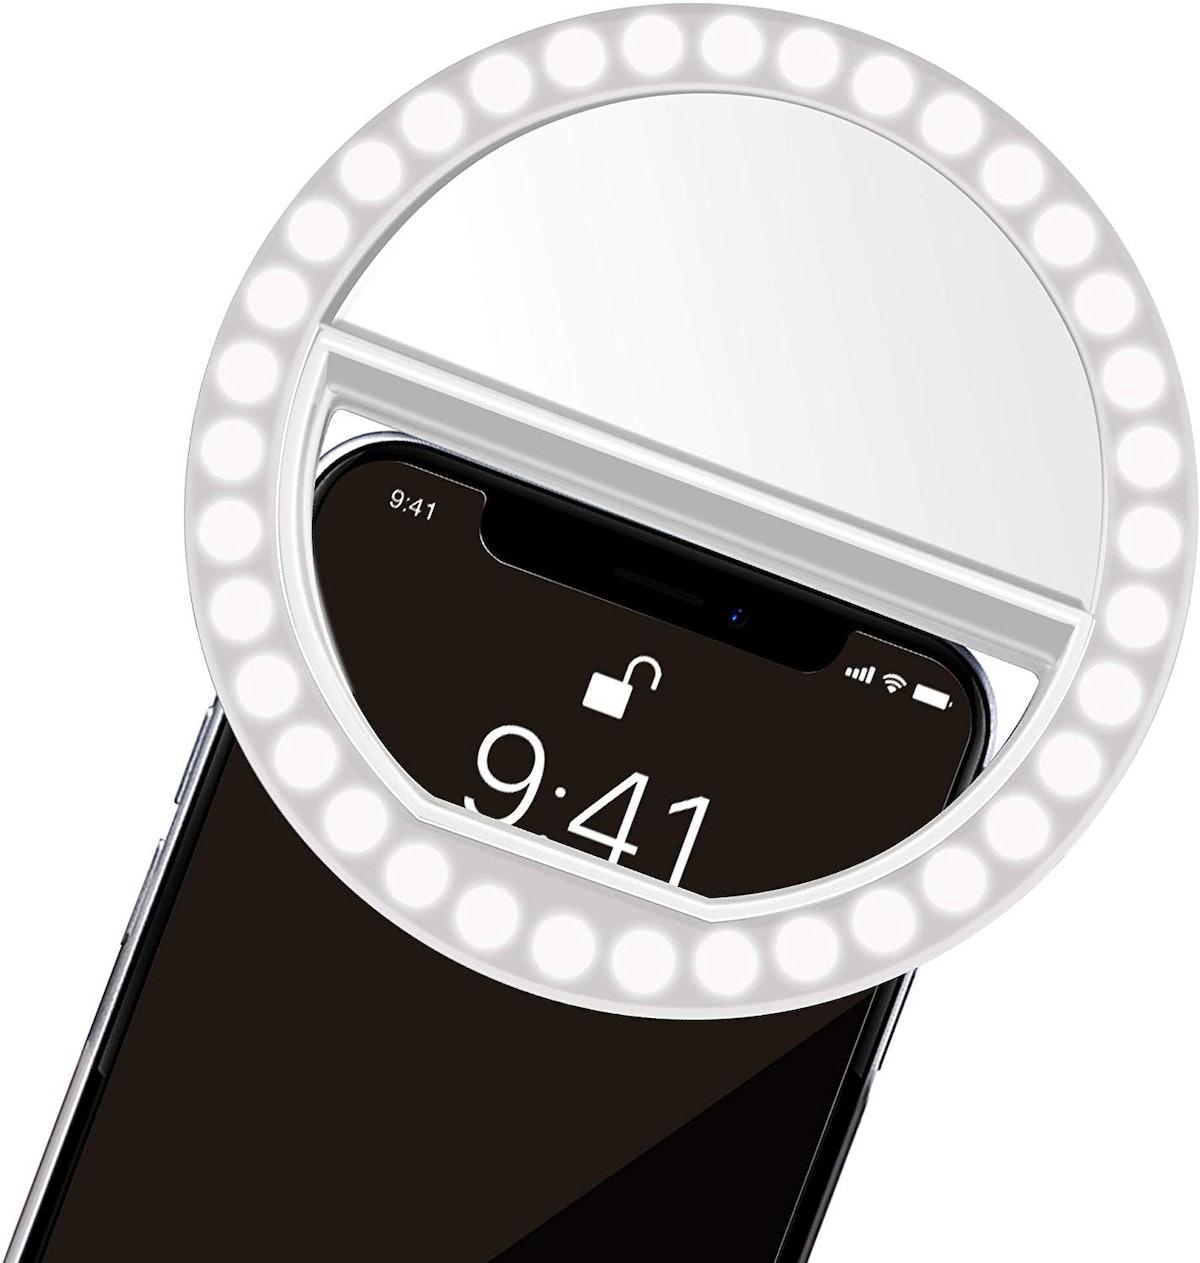 XINBAOHONG Selfie Ring Light